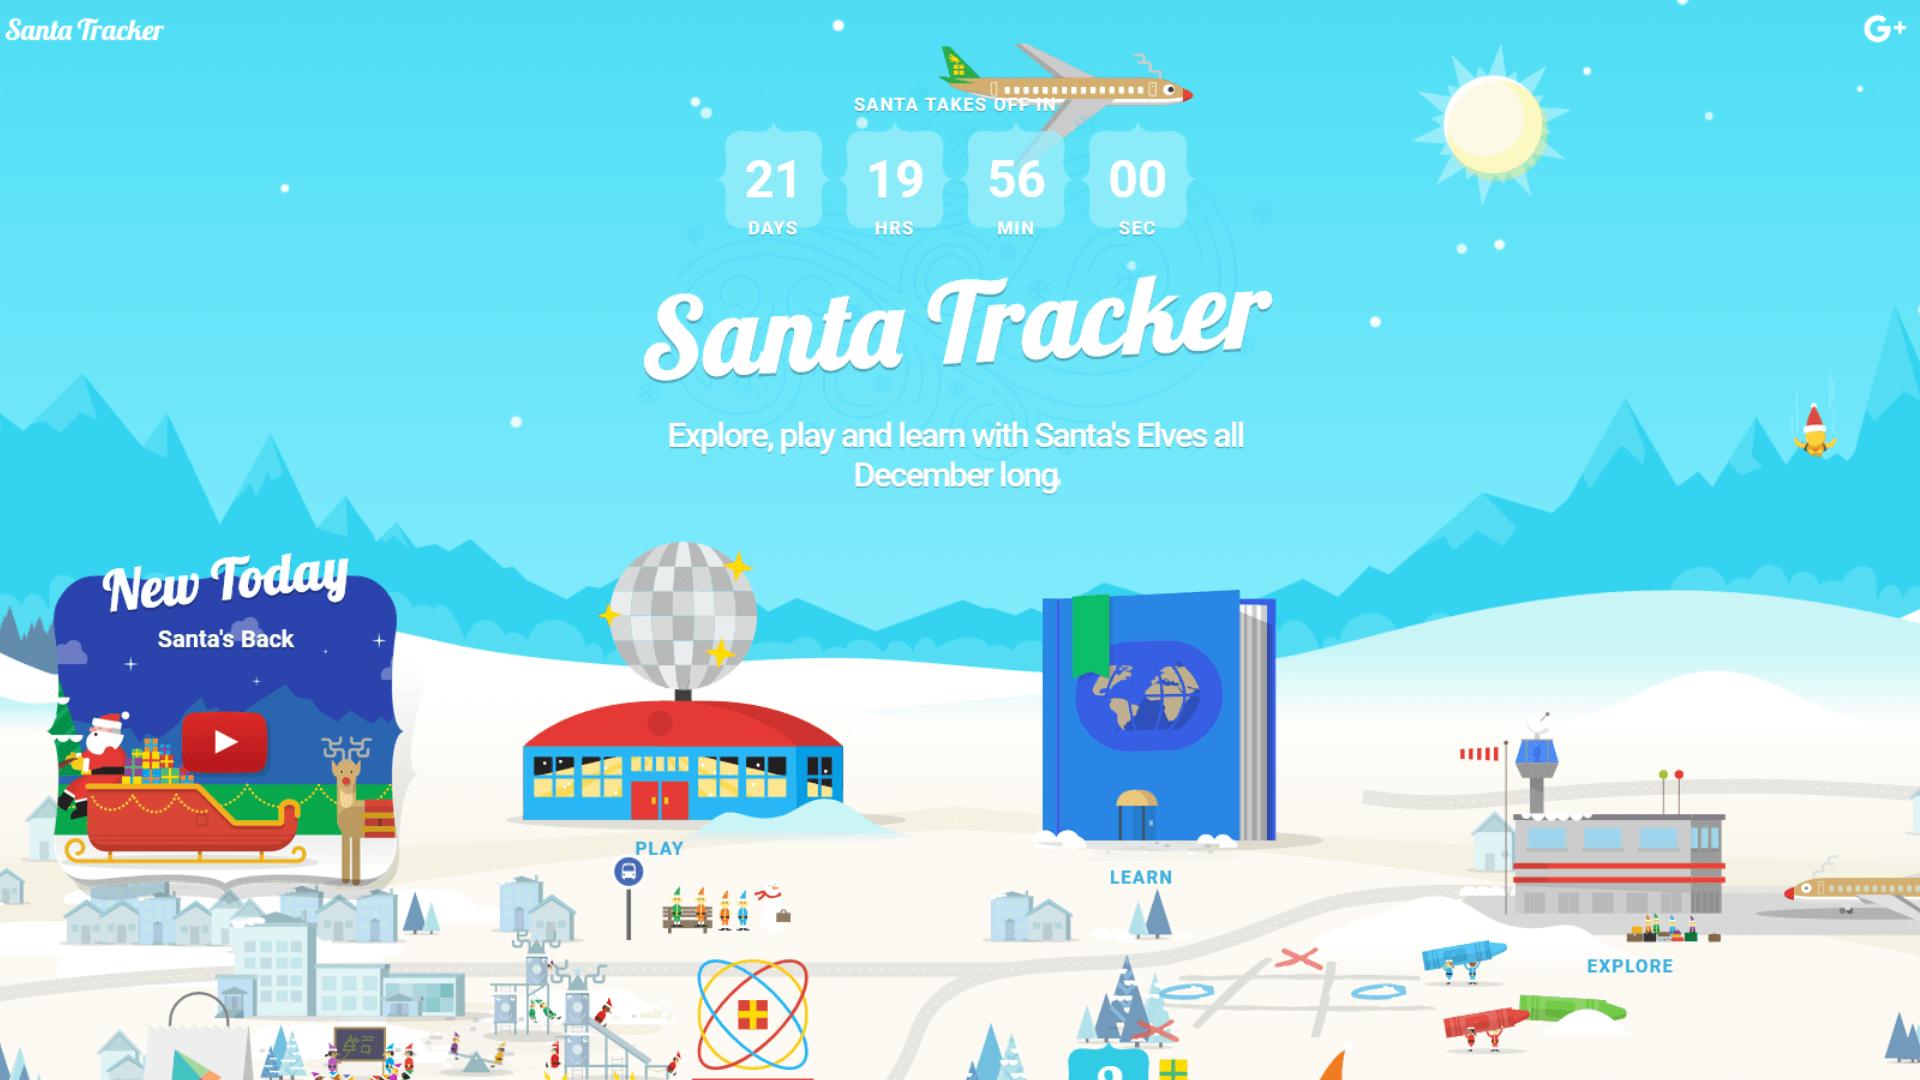 Google's 2016 Santa Tracker signals the official countdown